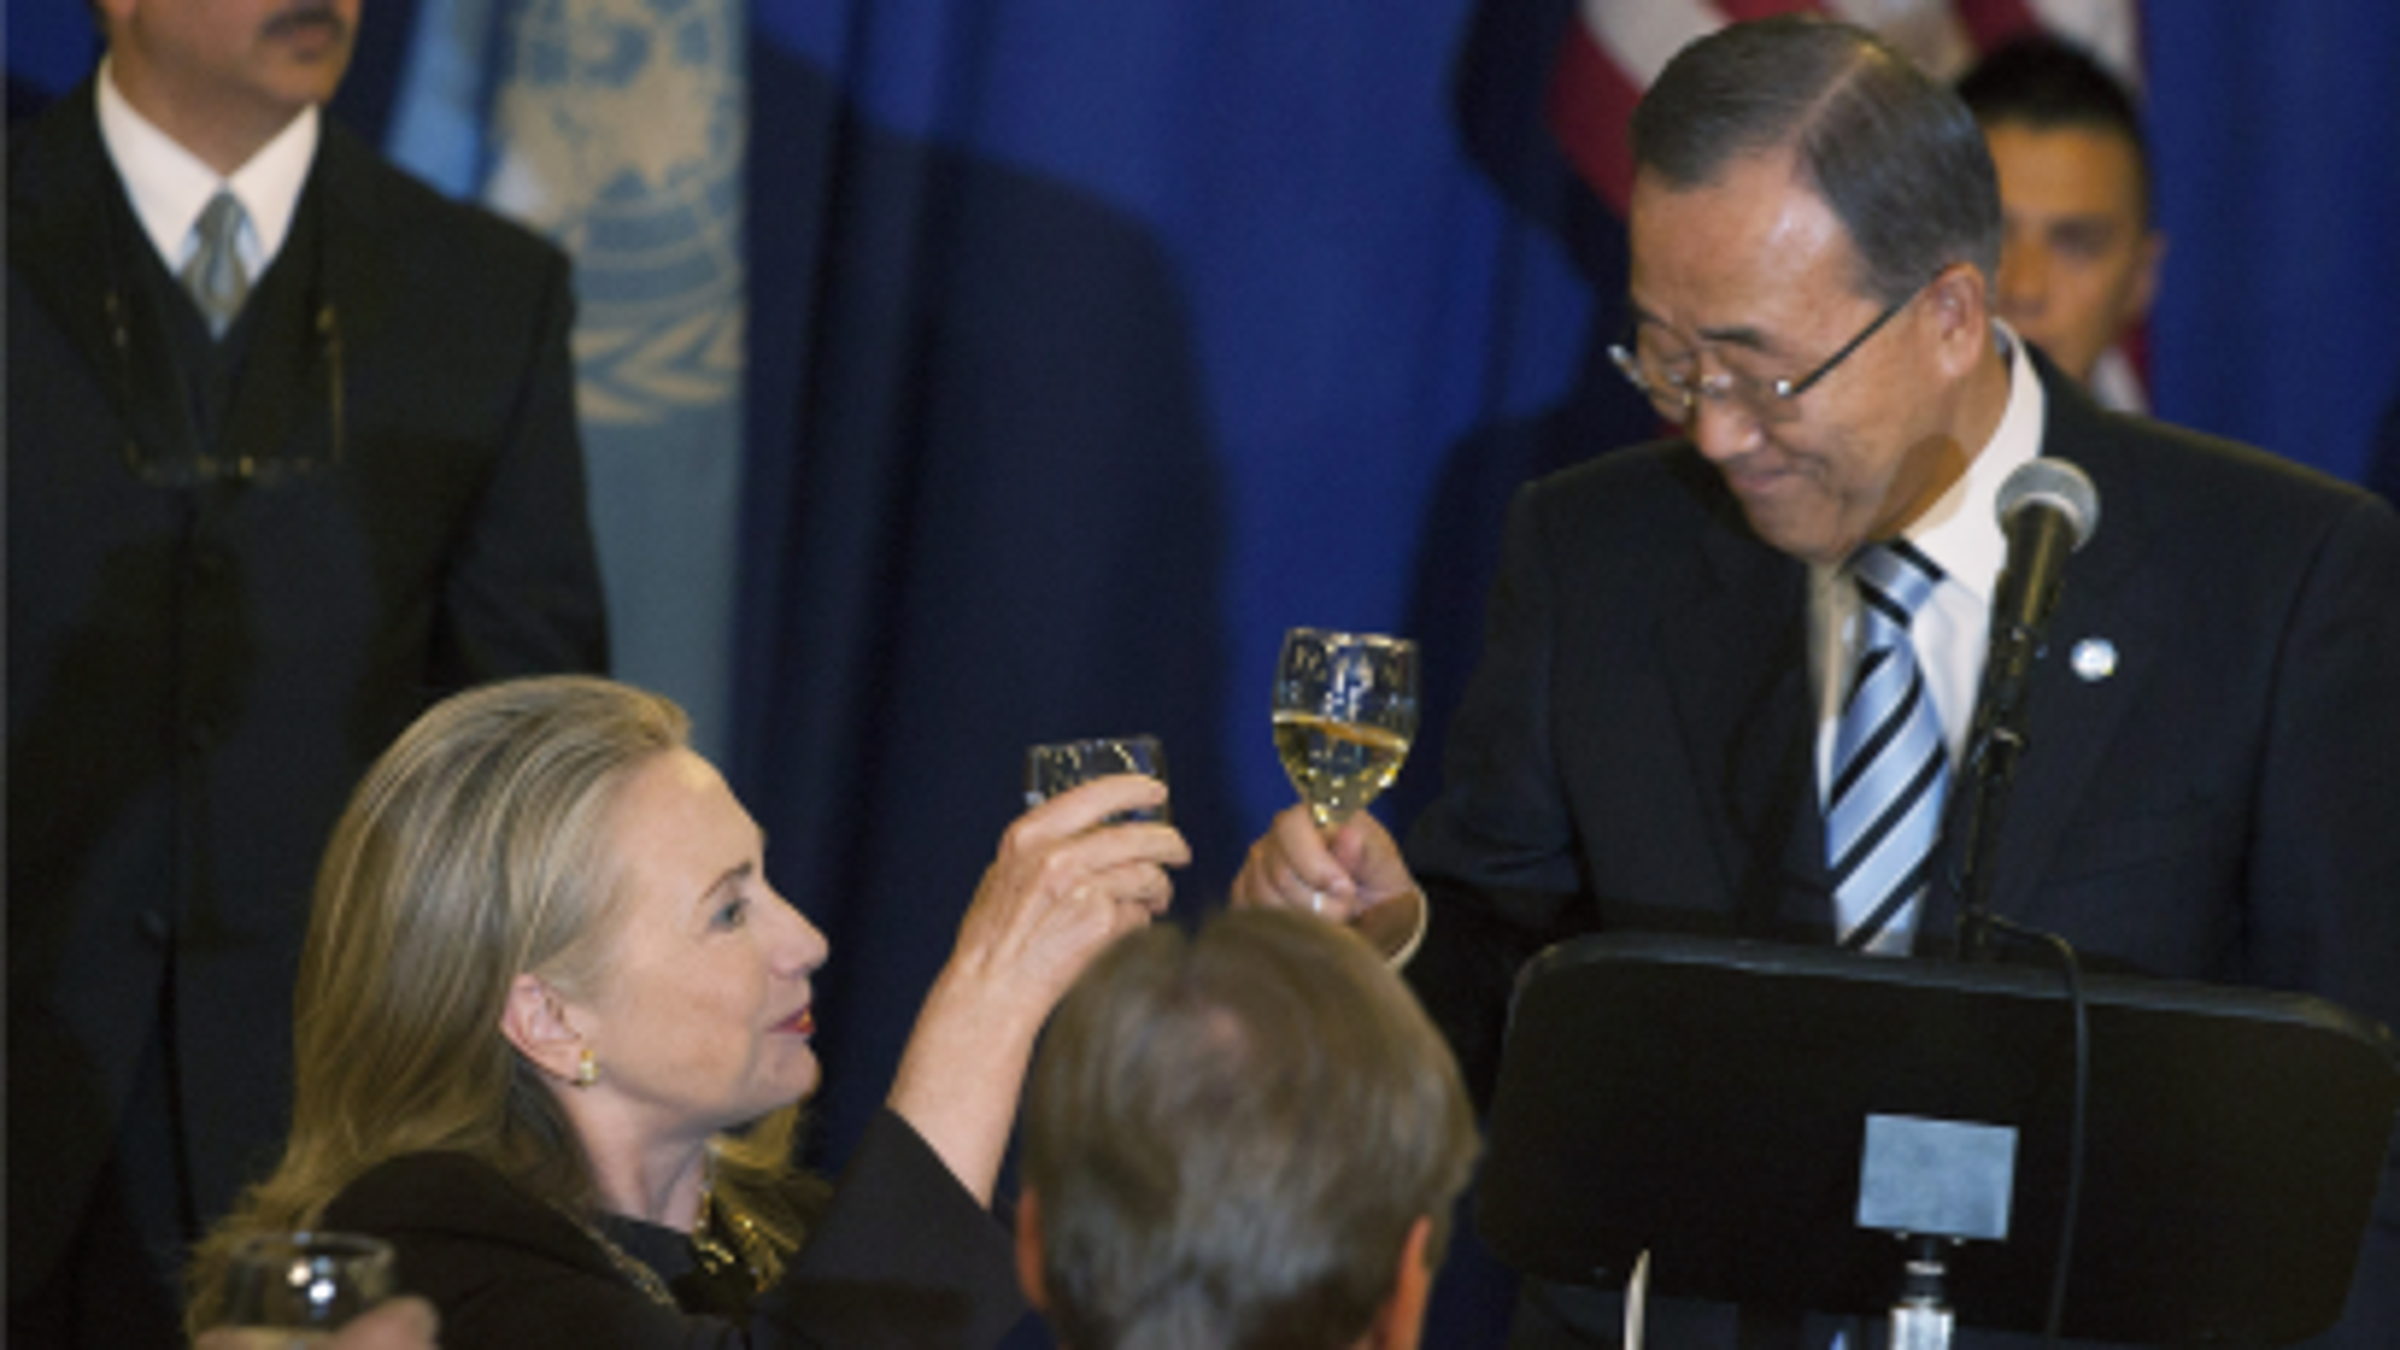 HIlary Clinton and Ban Ki Moon